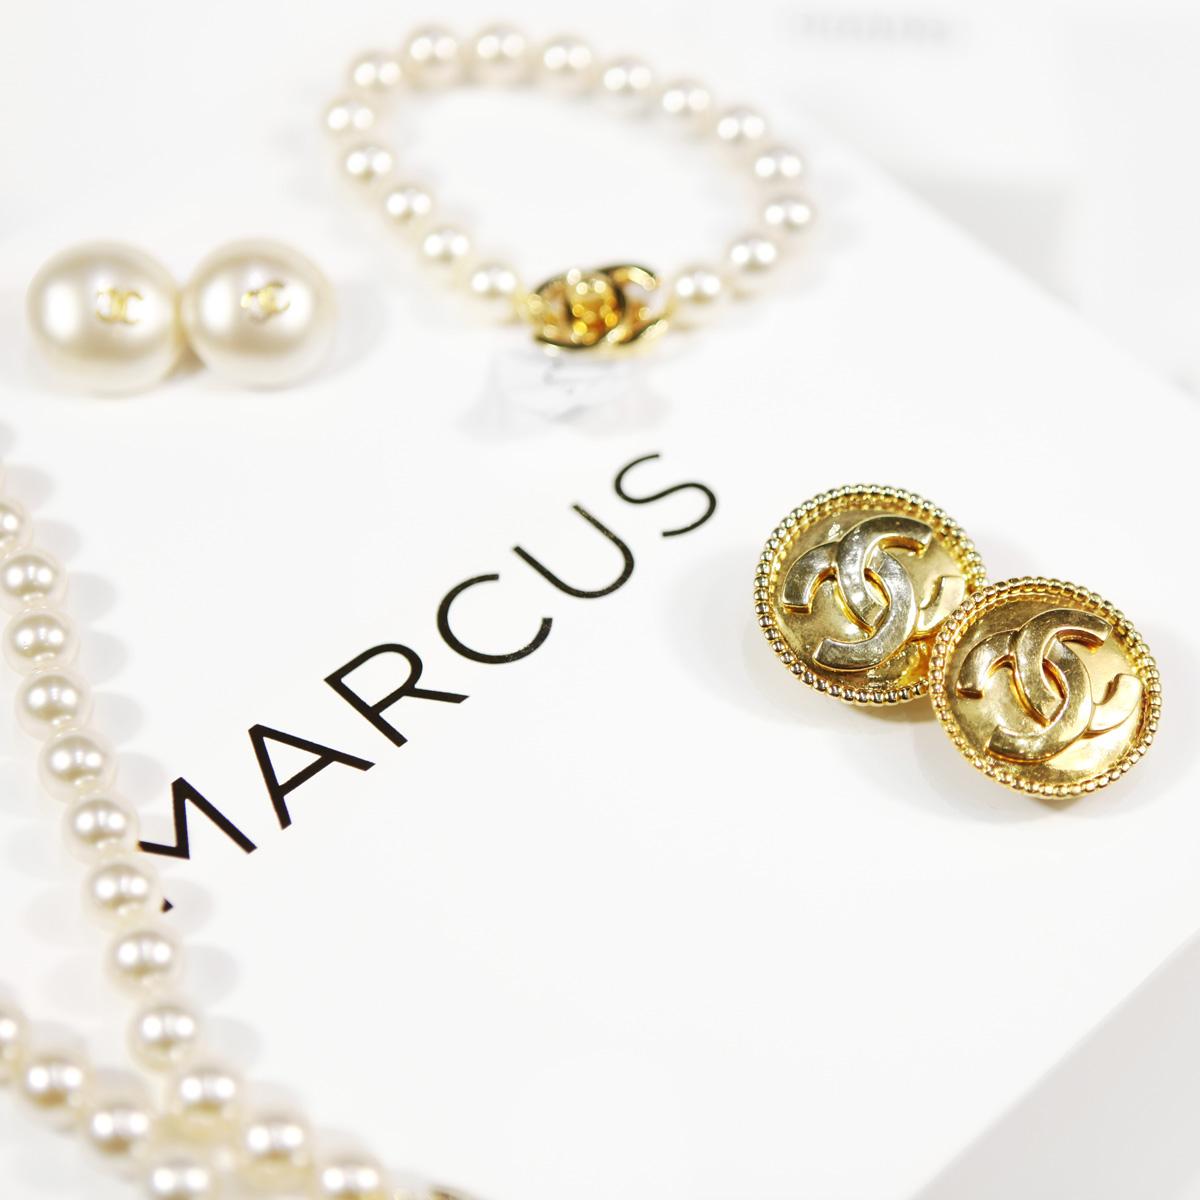 Marcus-Chanel Vintage_Aspen Palm Beach_0104.jpg